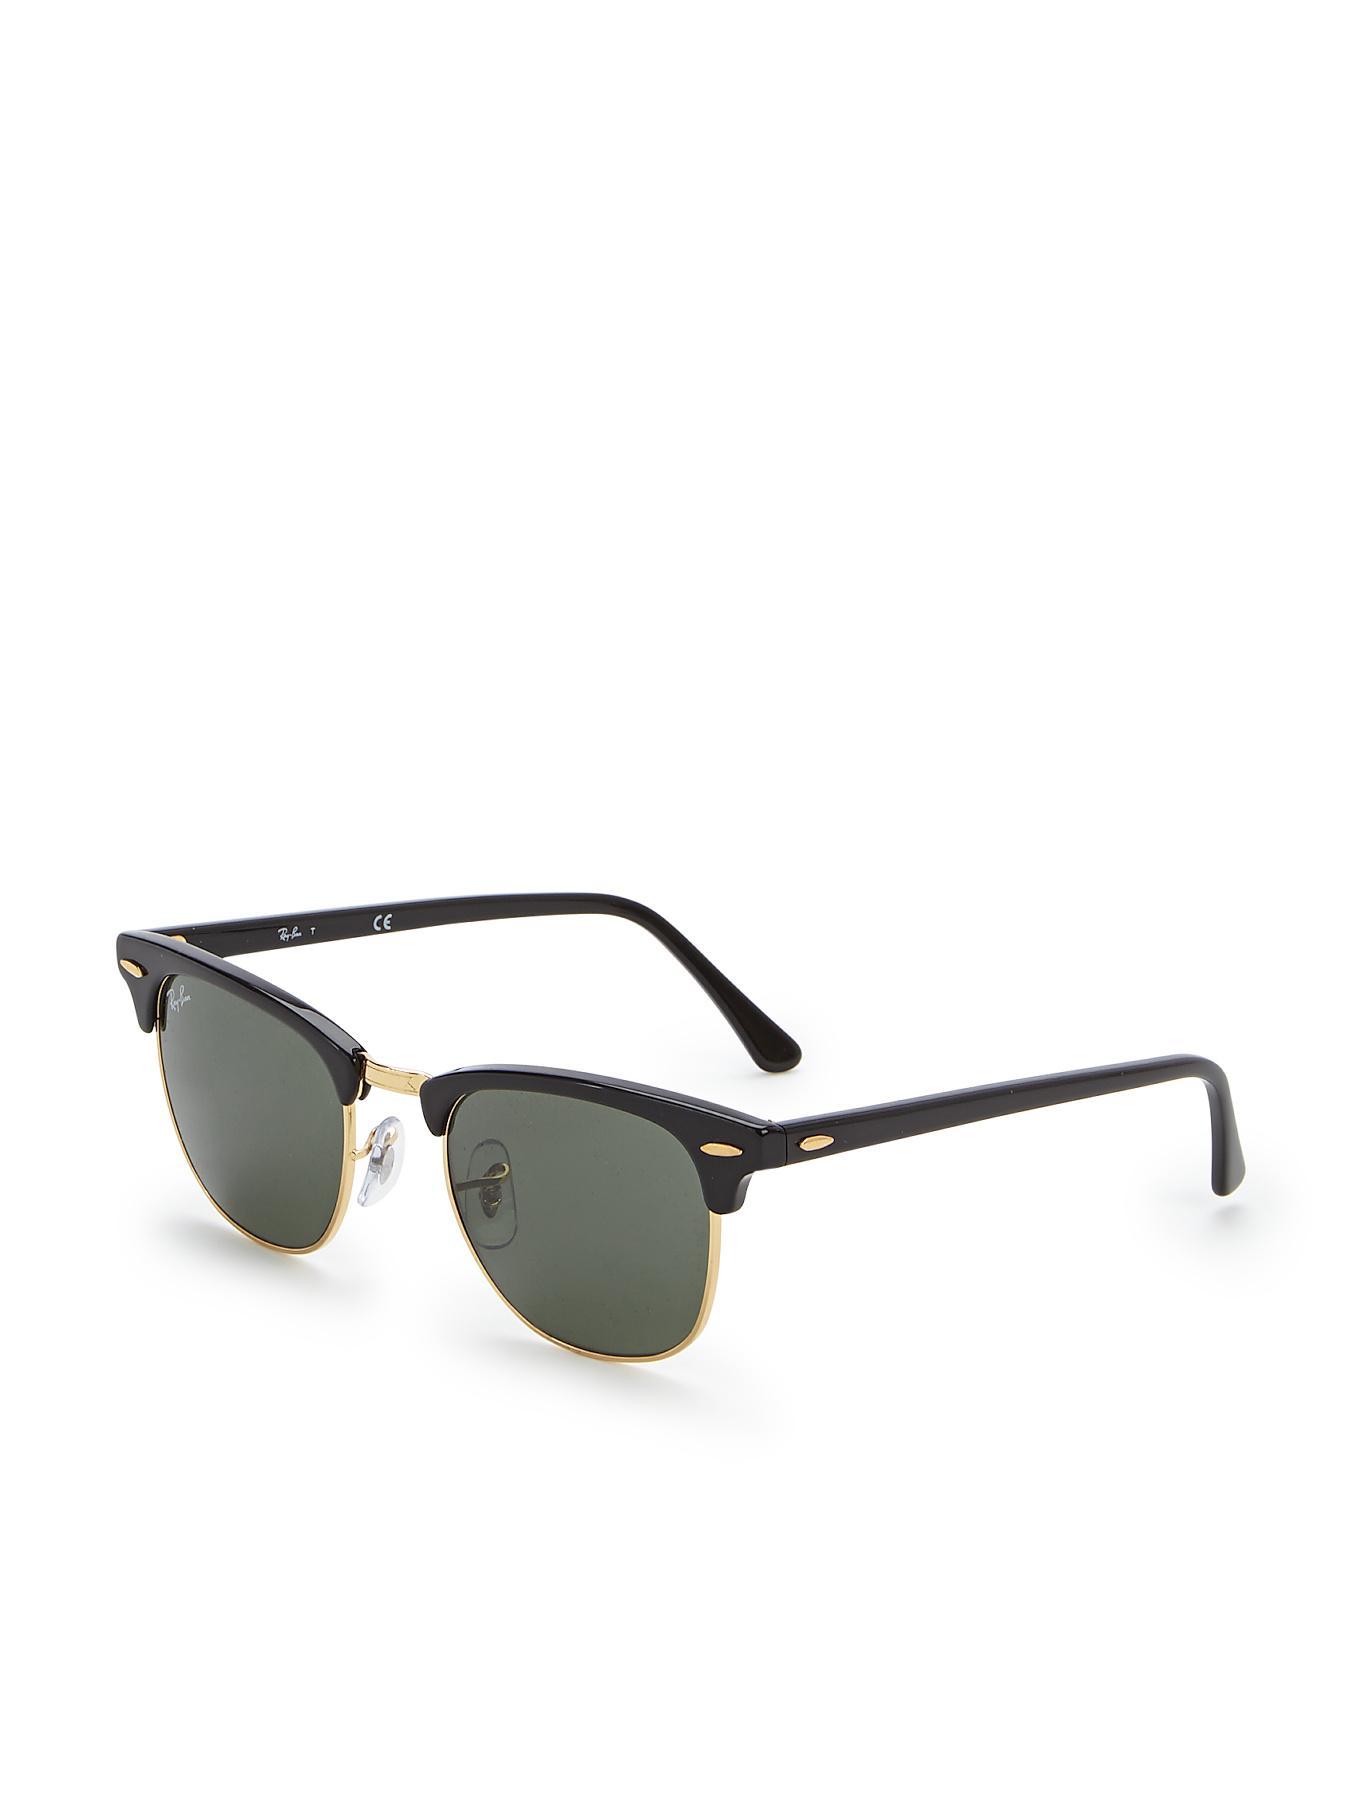 jackie o sunglasses ray ban wayfair promotions